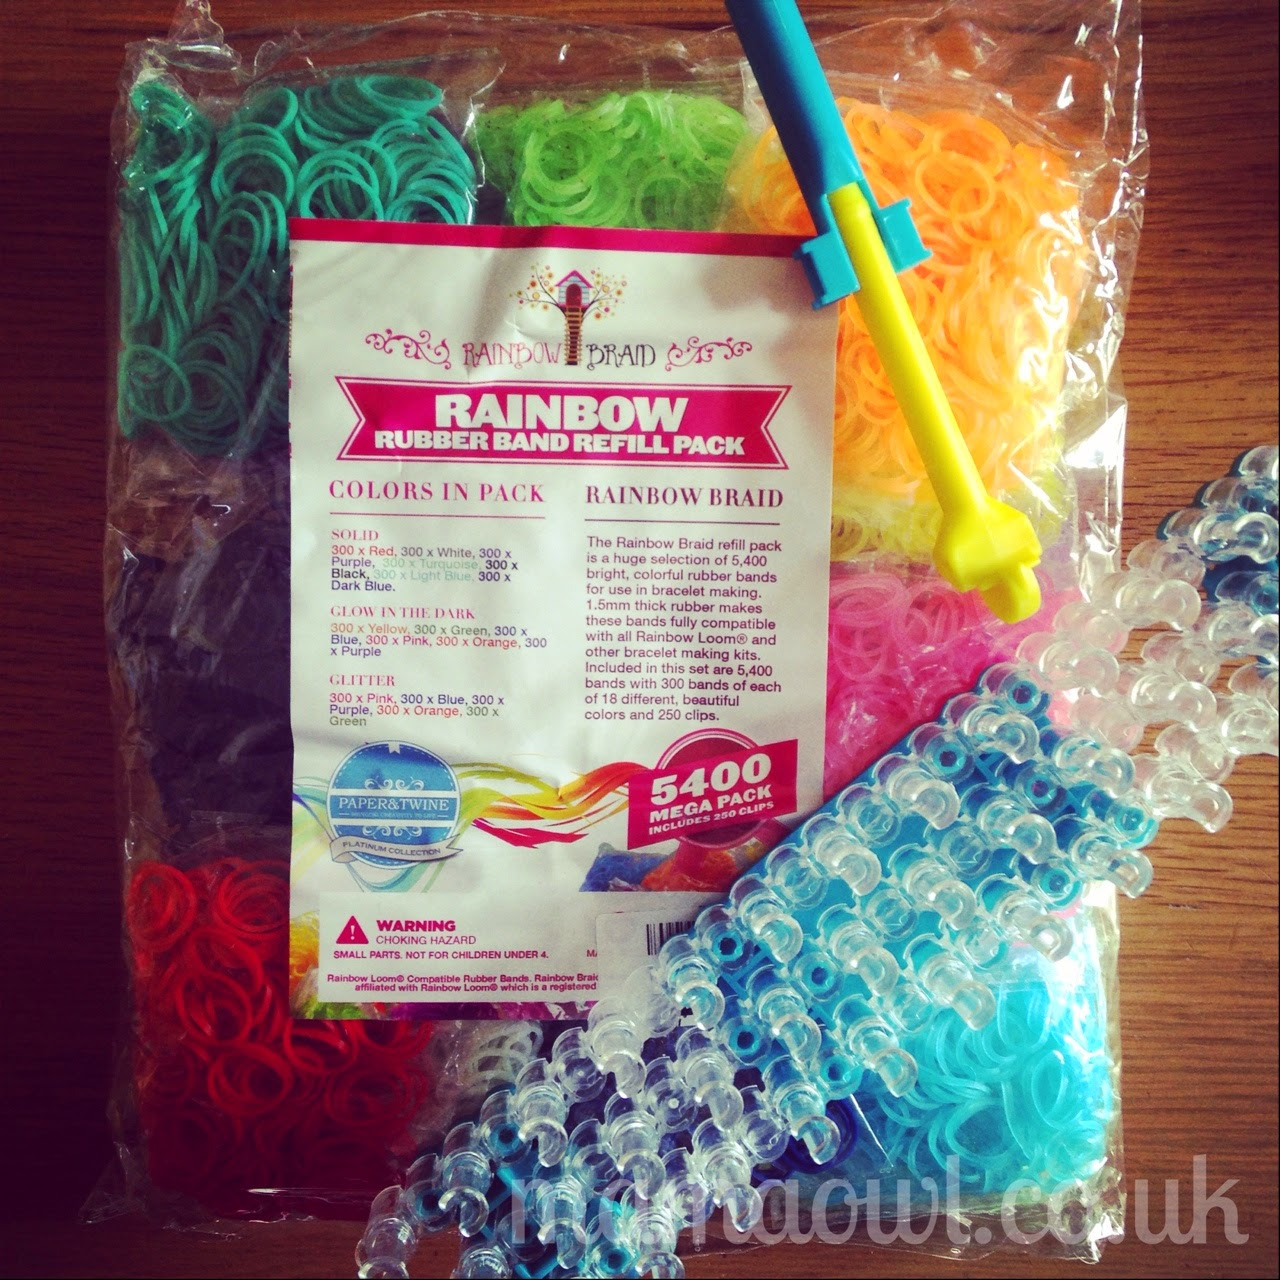 Rainbow Braid 5400 Refill Kit (Loom & Hook not included)